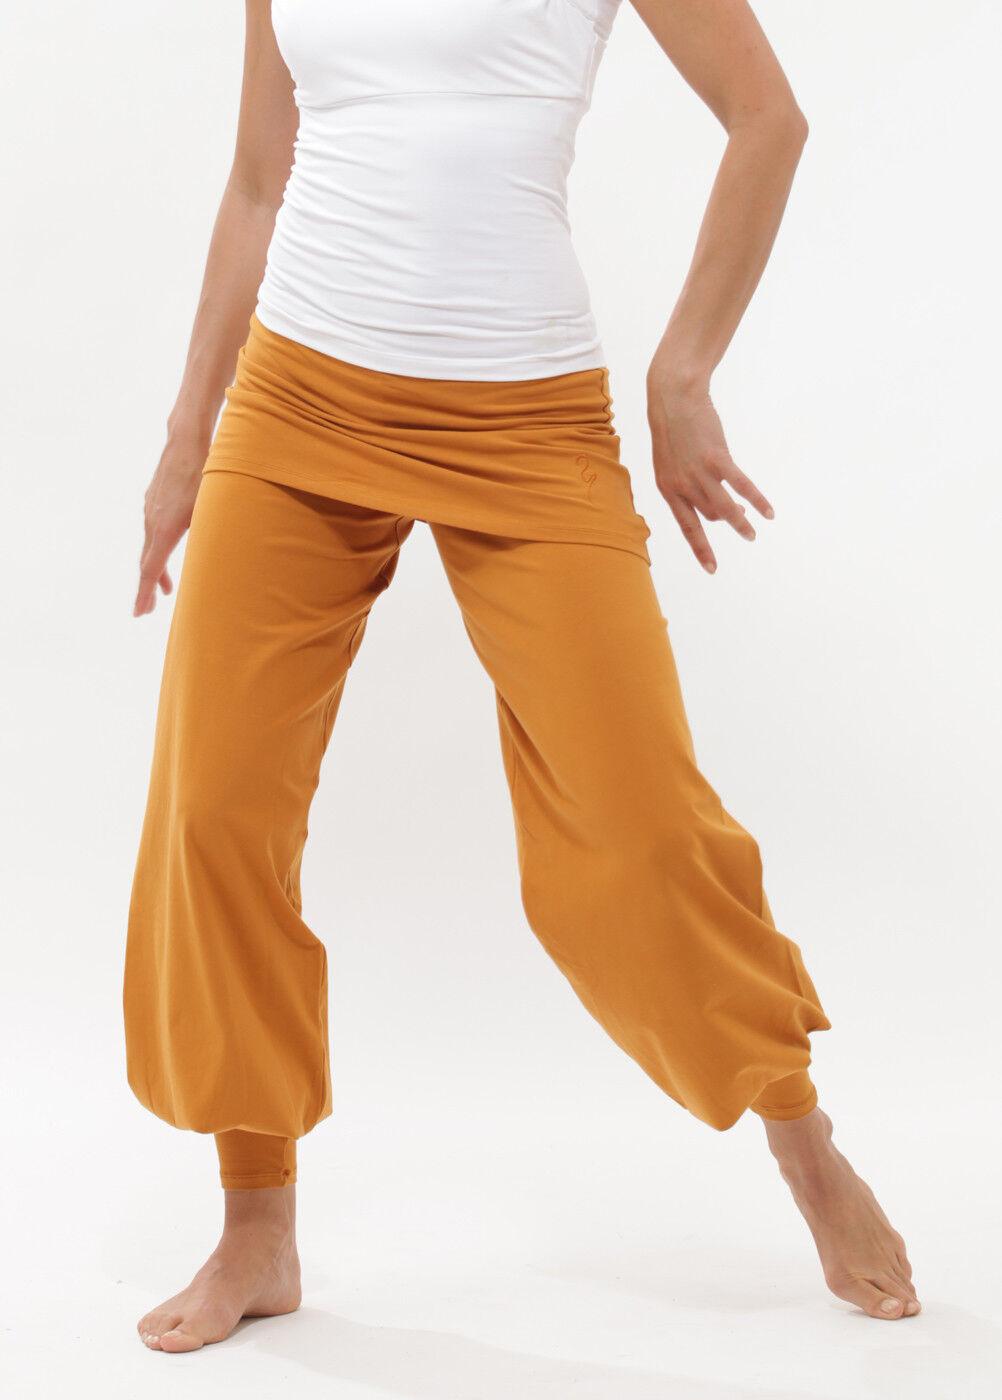 Yogahose  sohang  - Safran Safran Safran Orange von Breath Of Fire 38b7bc